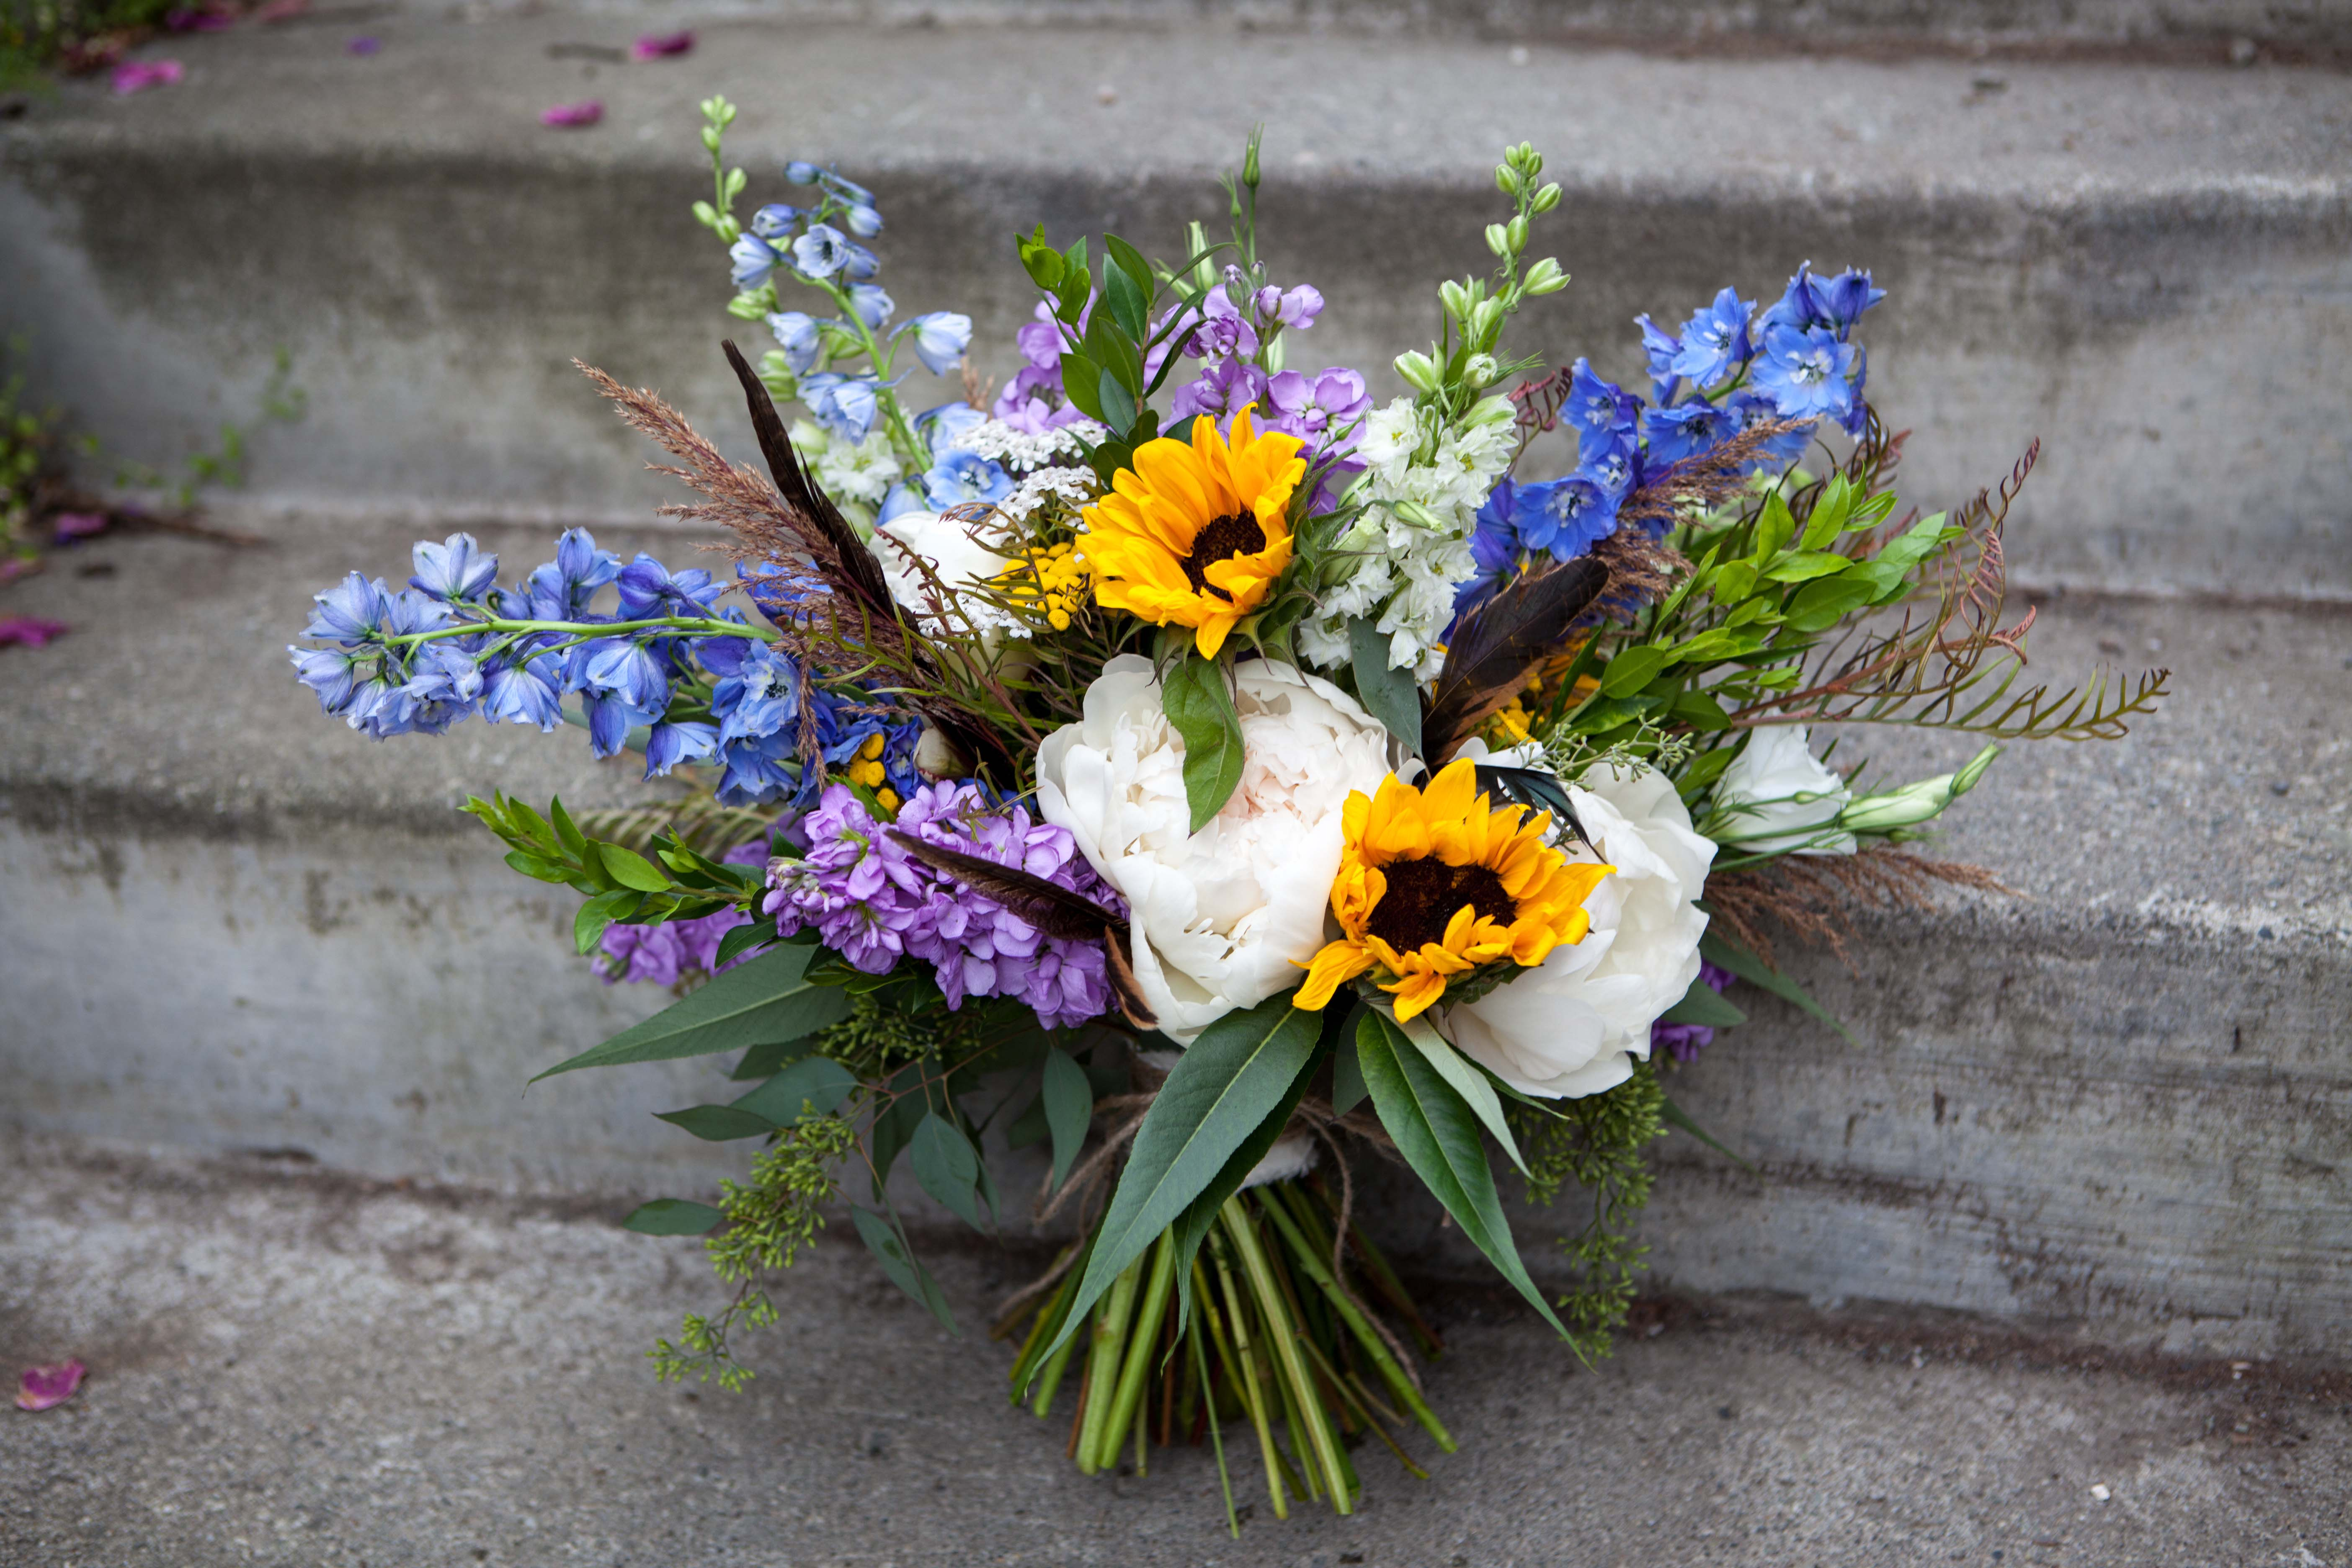 Floral design by Natasha Price of Paper Peony Alaska